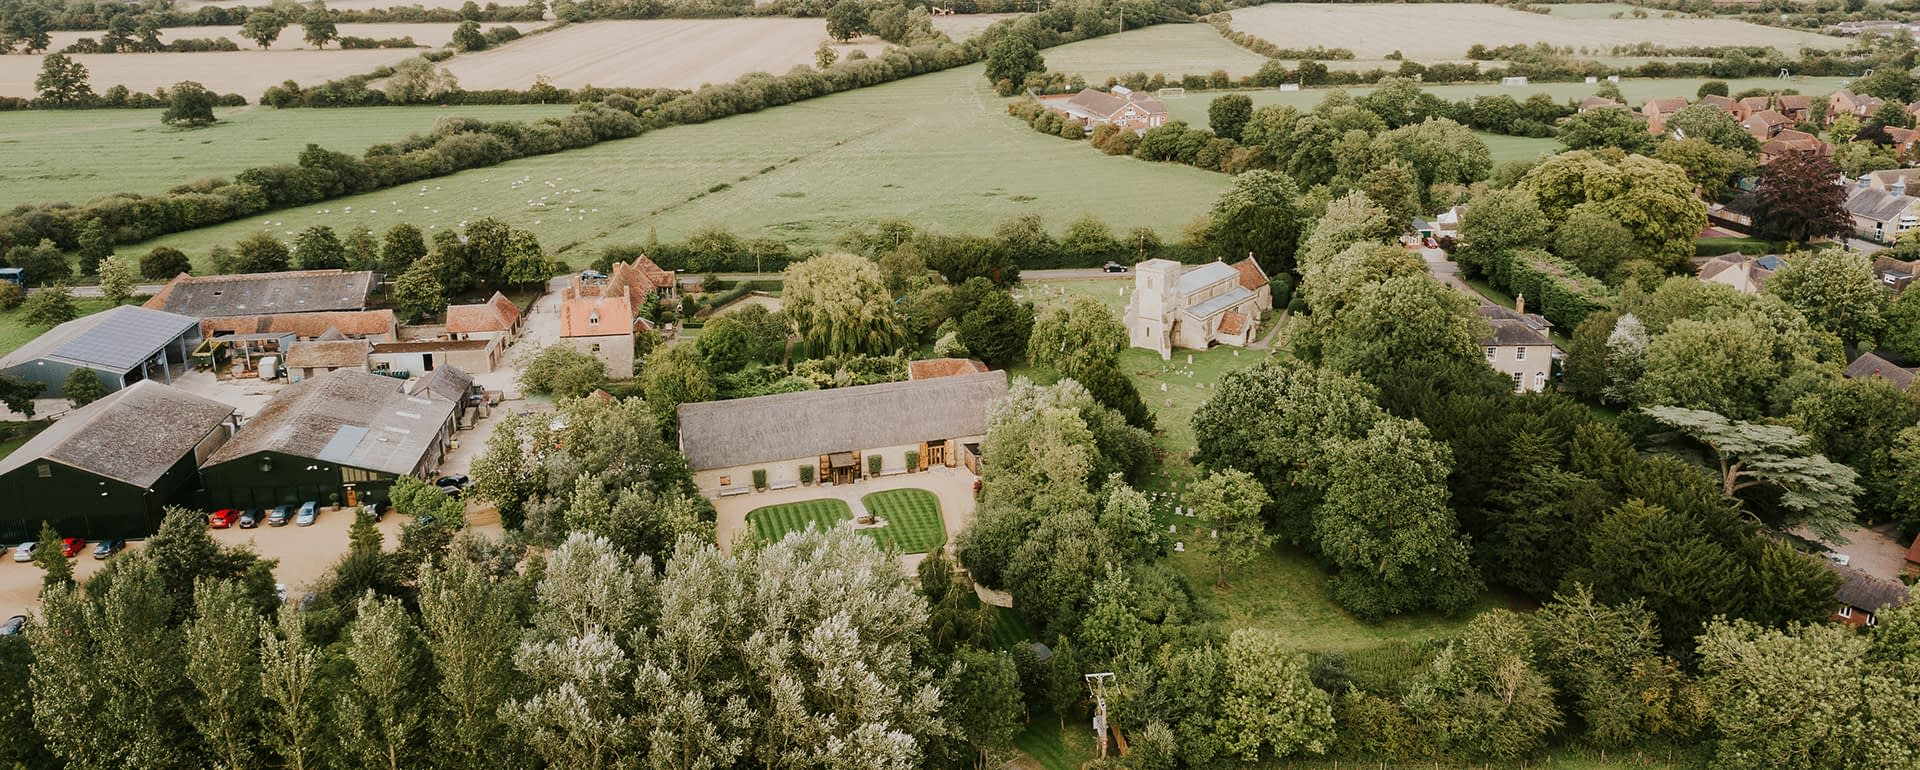 The Inspiration – Farmhouse at The Tythe Barn